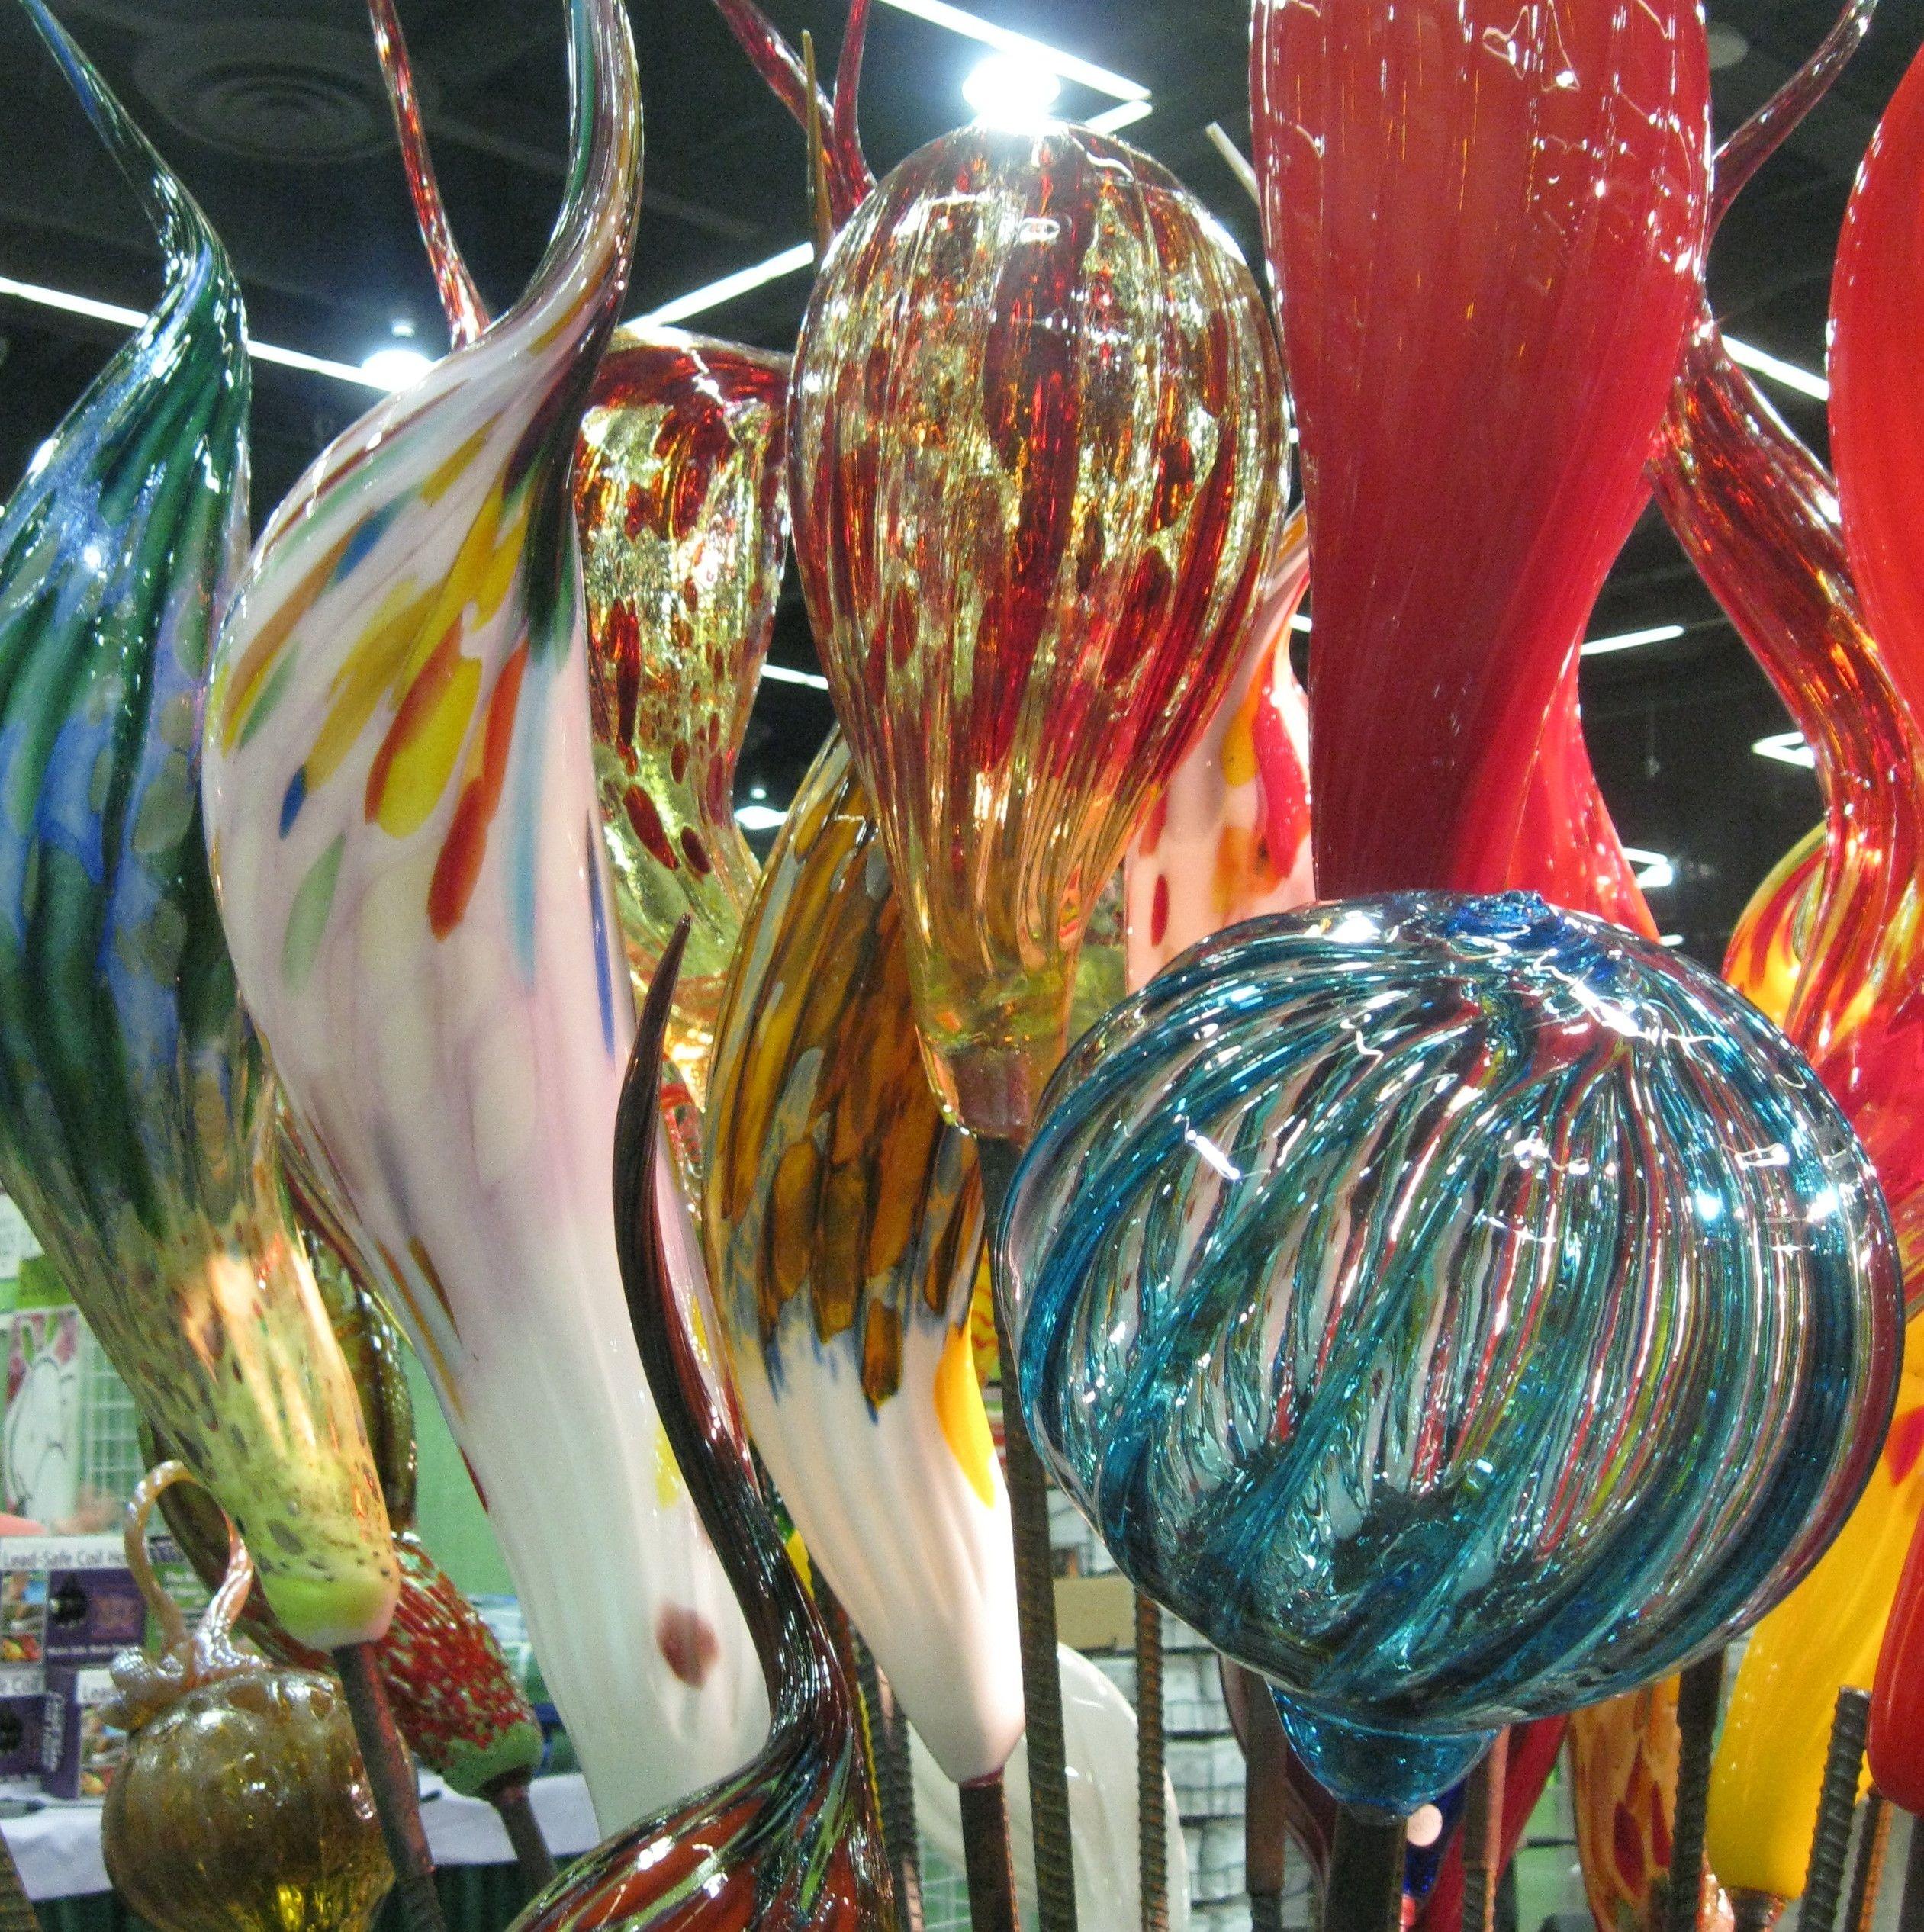 Beautiful Blown Glass Garden Art At The Portland Yard, Garden U0026 Patio Show.